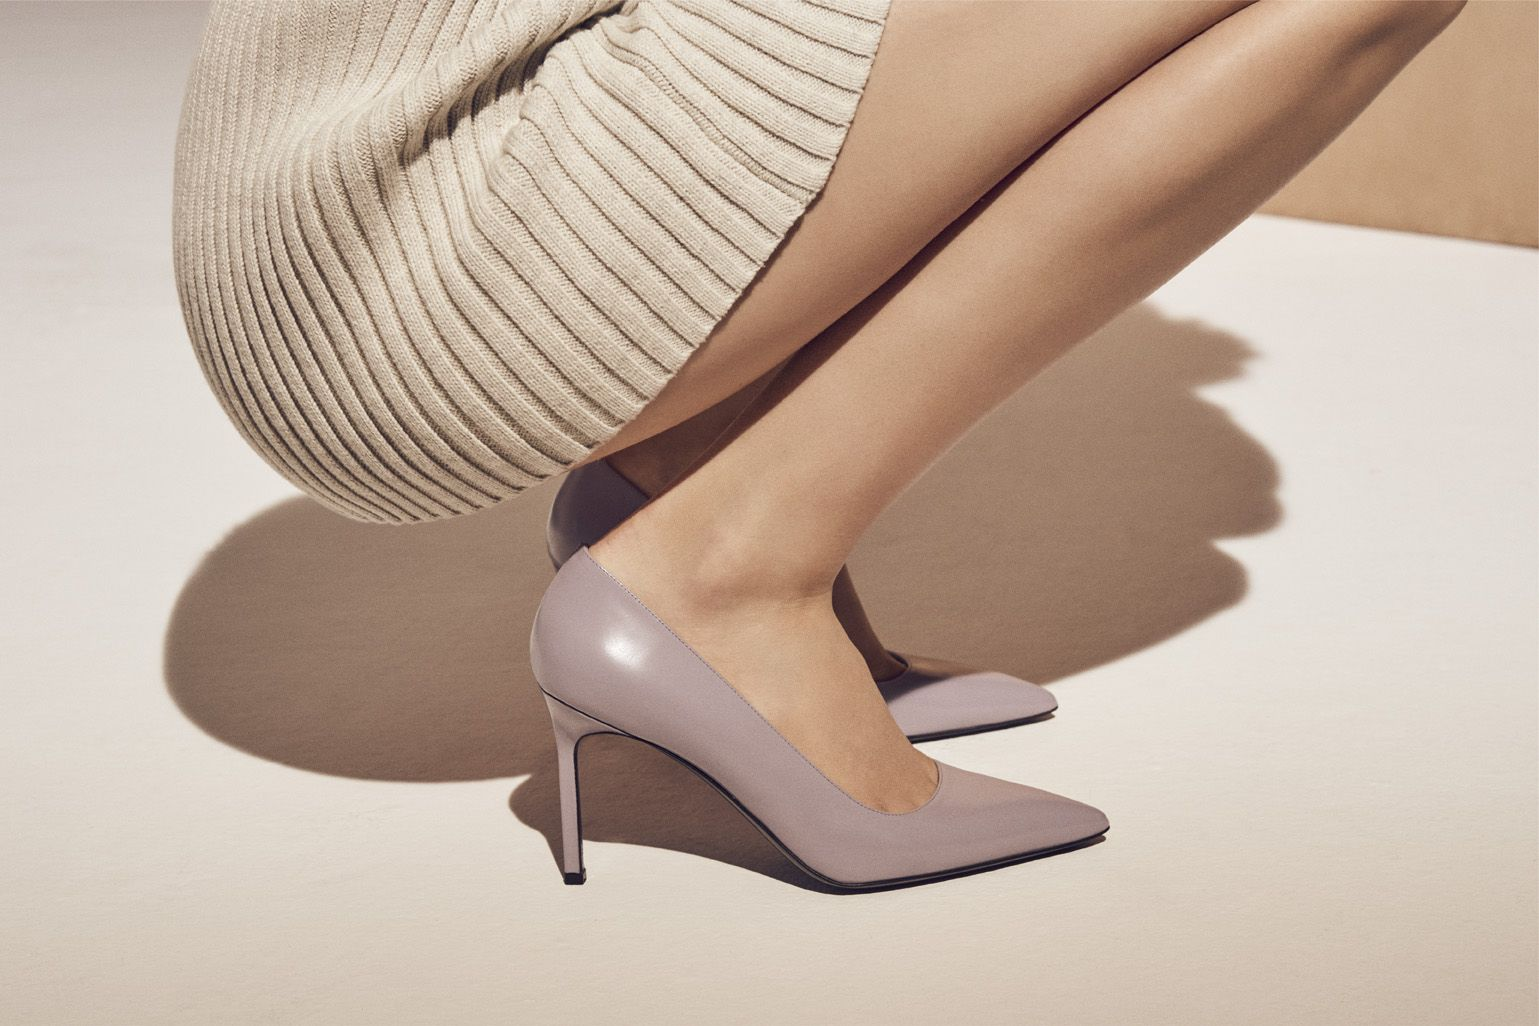 b8f8e6c0a012 NIKOLE Stiletto Heels, Pointed Heels, Spiked Heels, High Heels, Spike Heels,